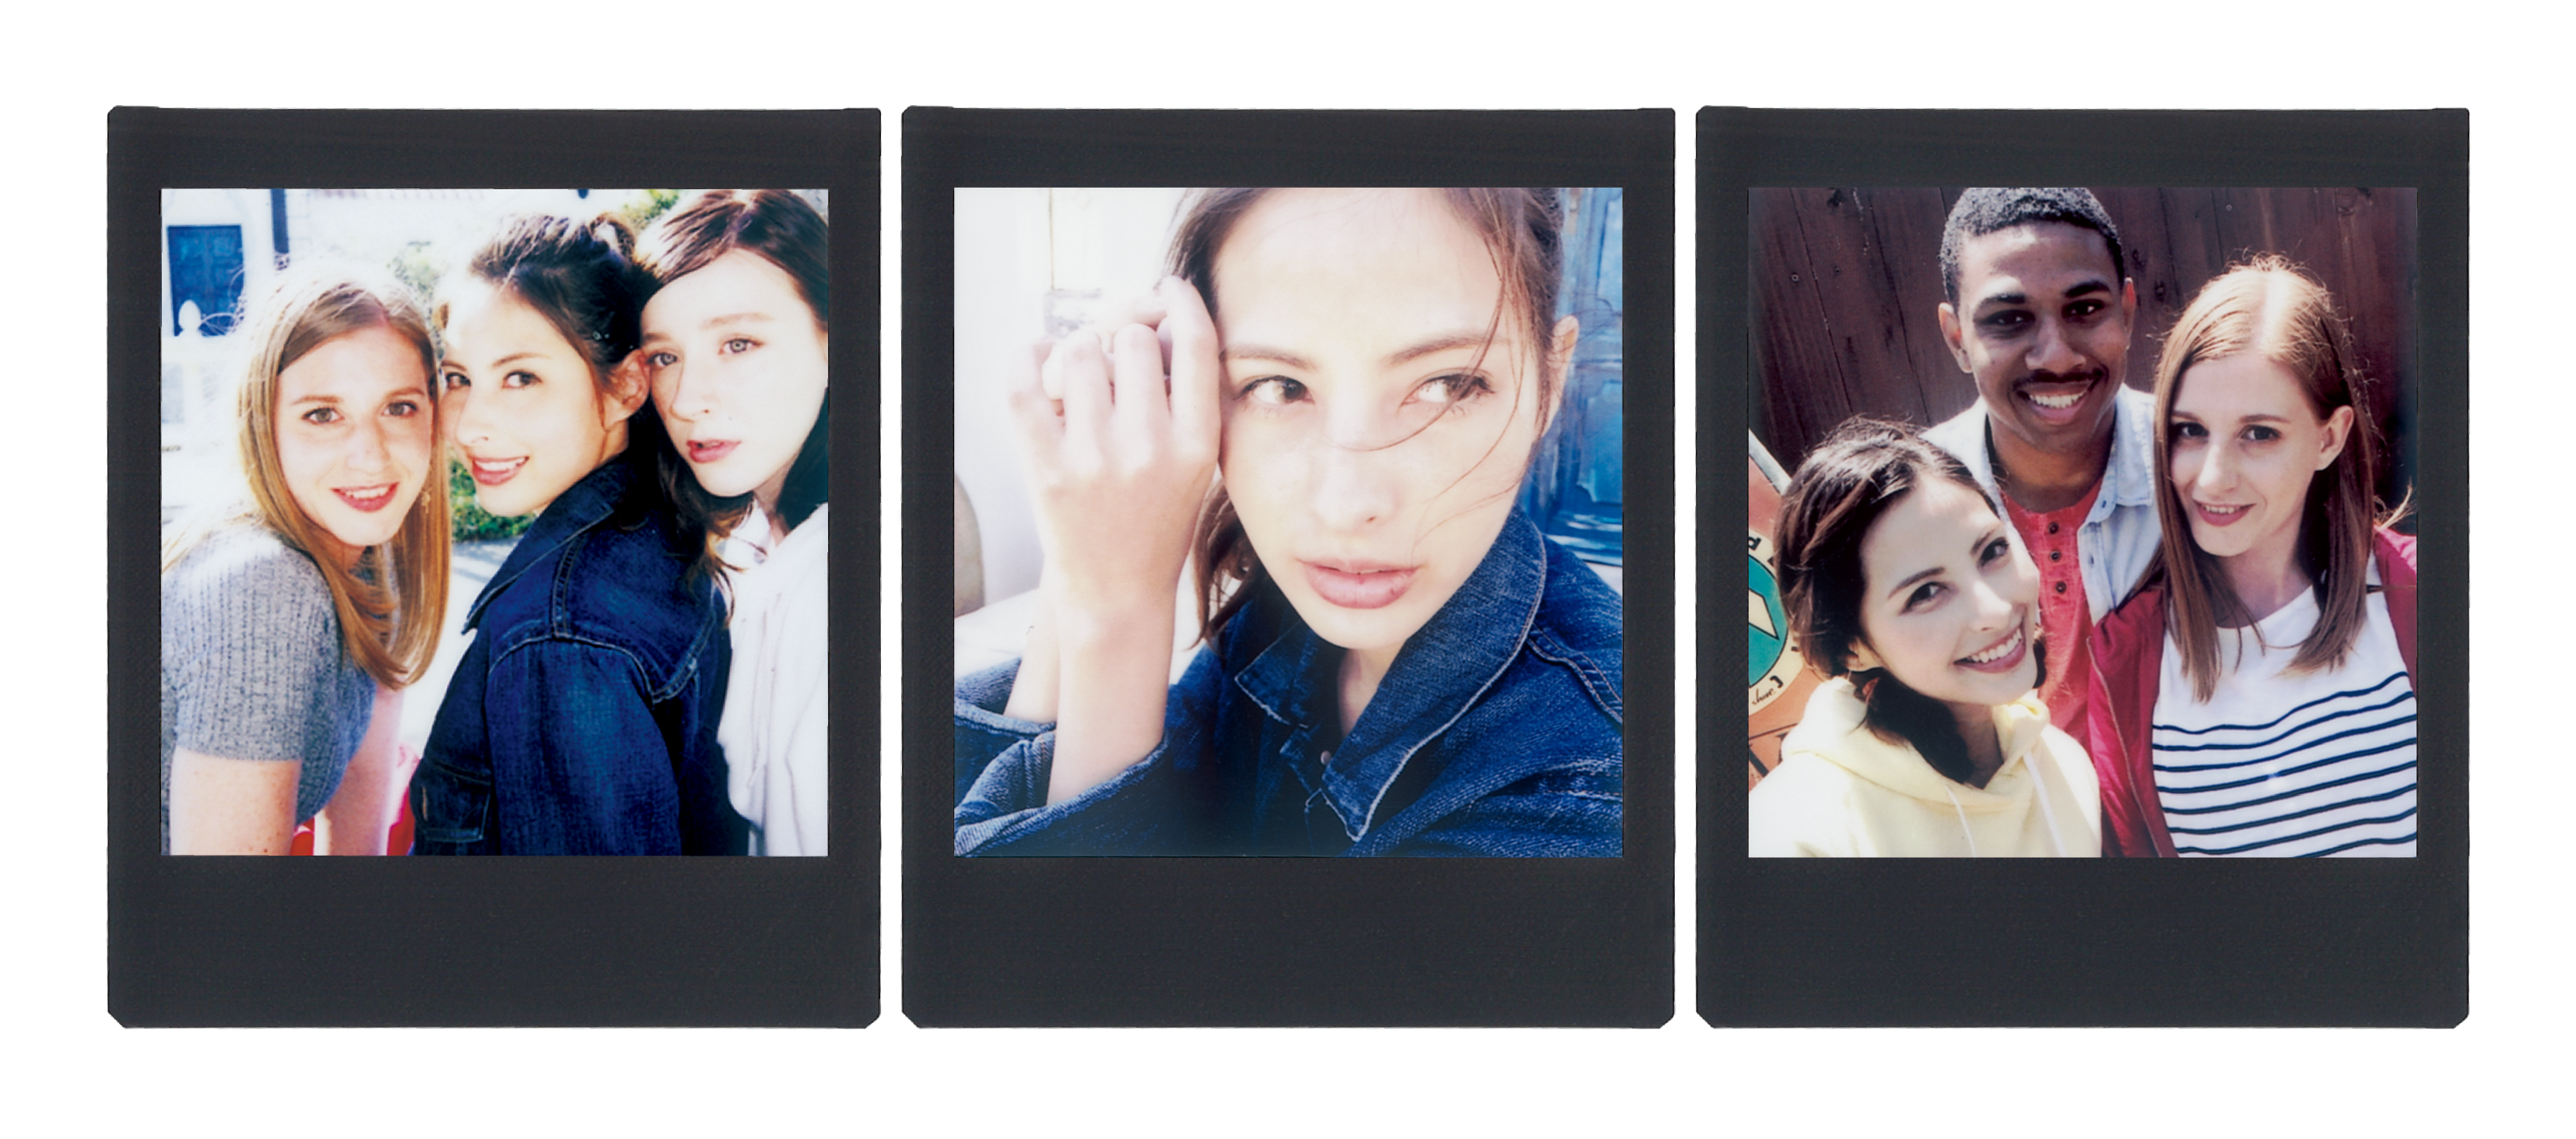 instax-square-film-black-frame-detail